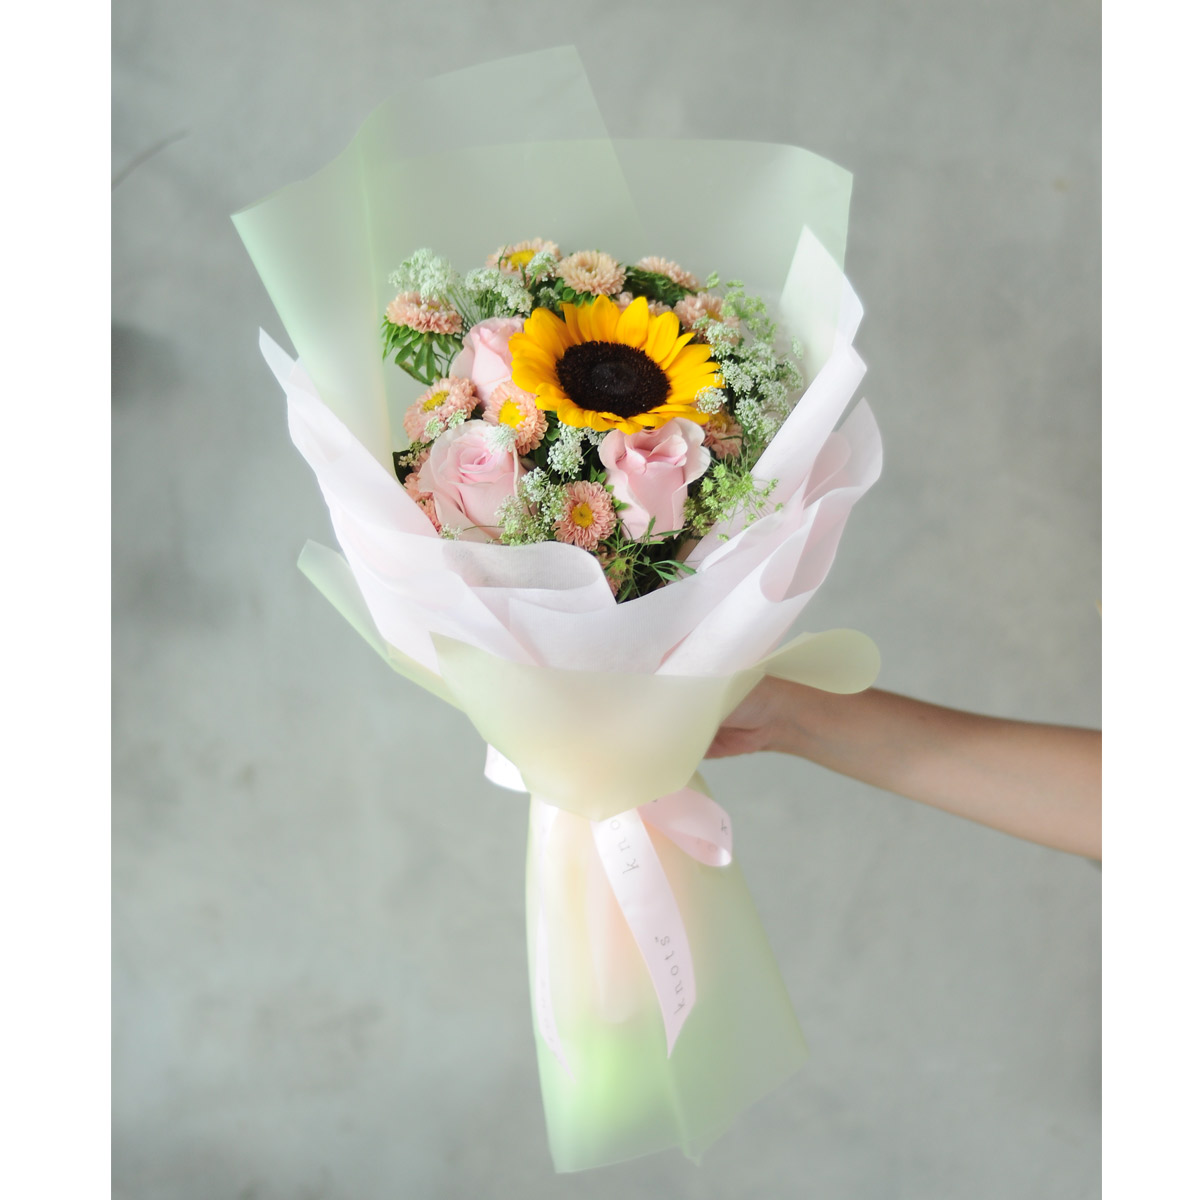 1stalkSunflowerwRosesA_1200